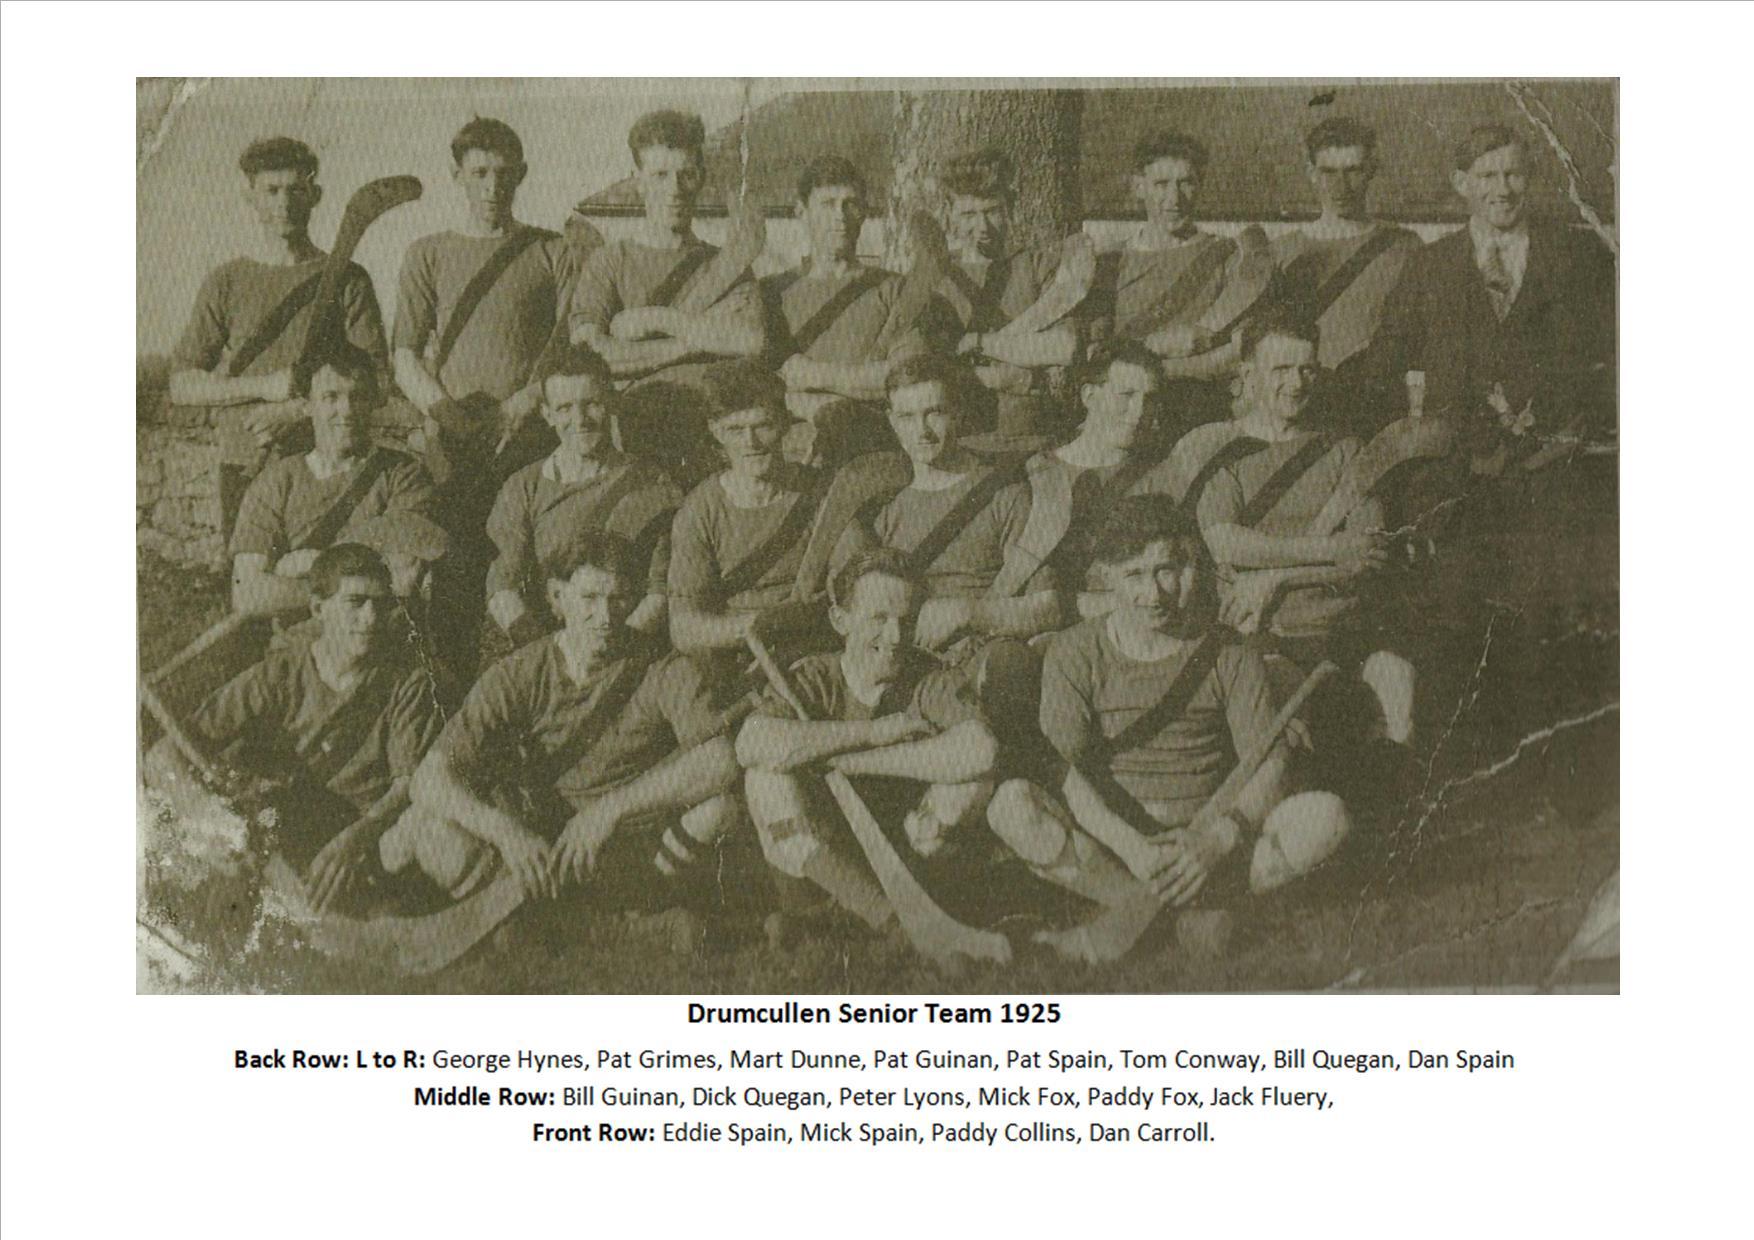 Drumcullen Senior Team - 1925